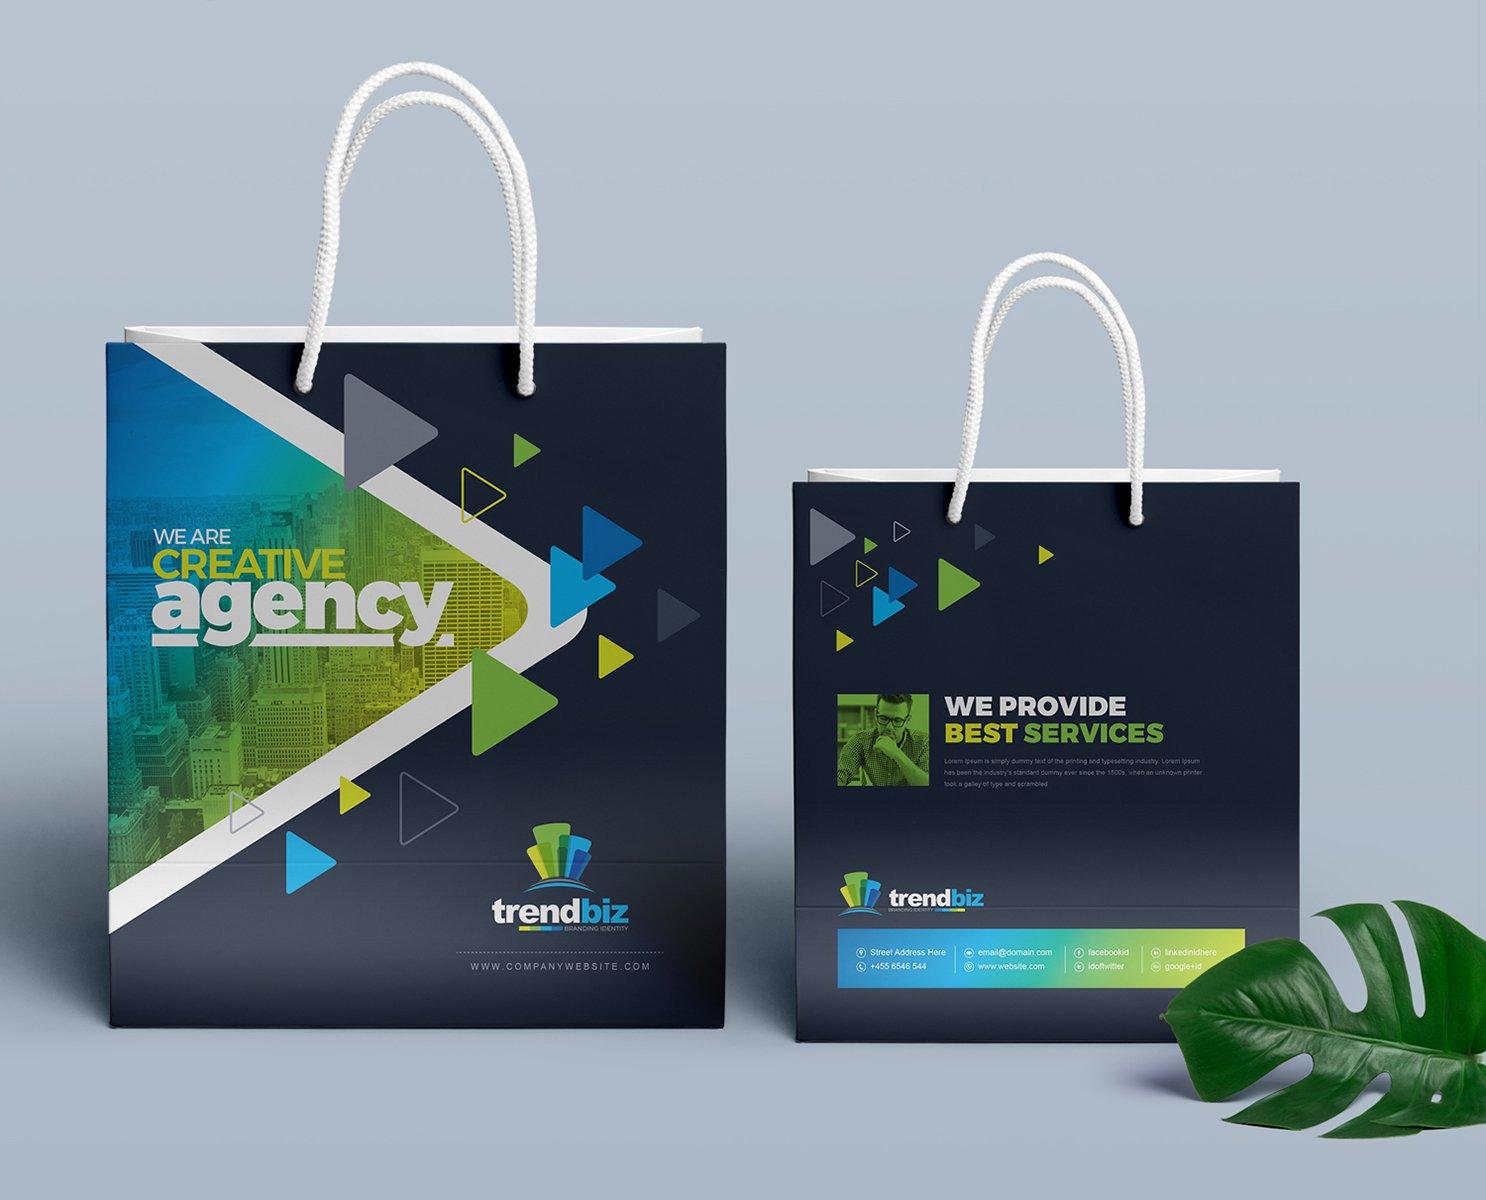 Stationery Branding Identity Bundle - $39 - 28 Shopping Bag Standard Size